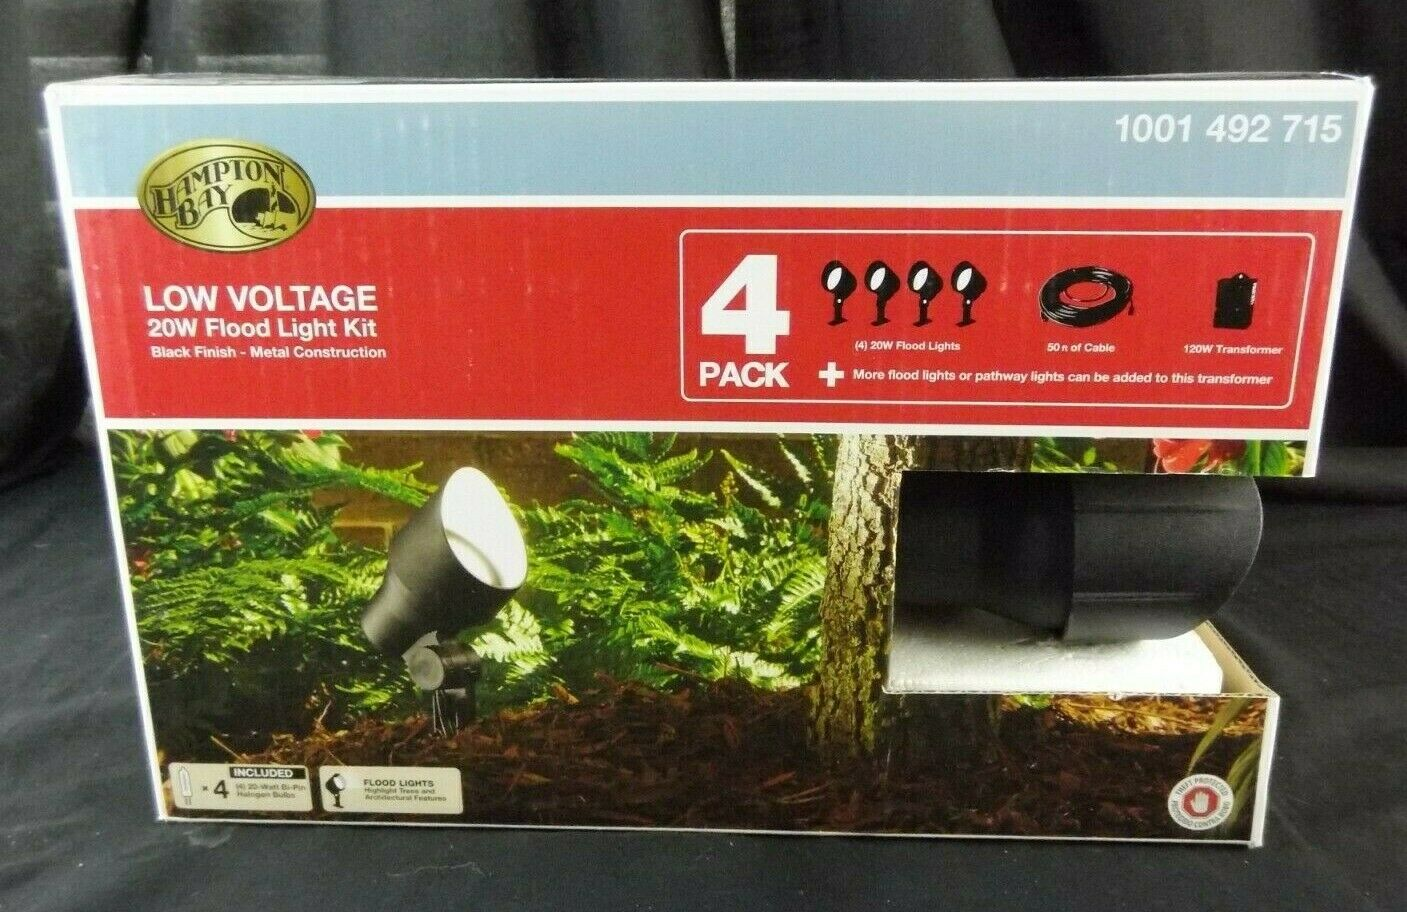 4-Pack Low Voltage 20W Flood Light Kit / 120 Power Pack